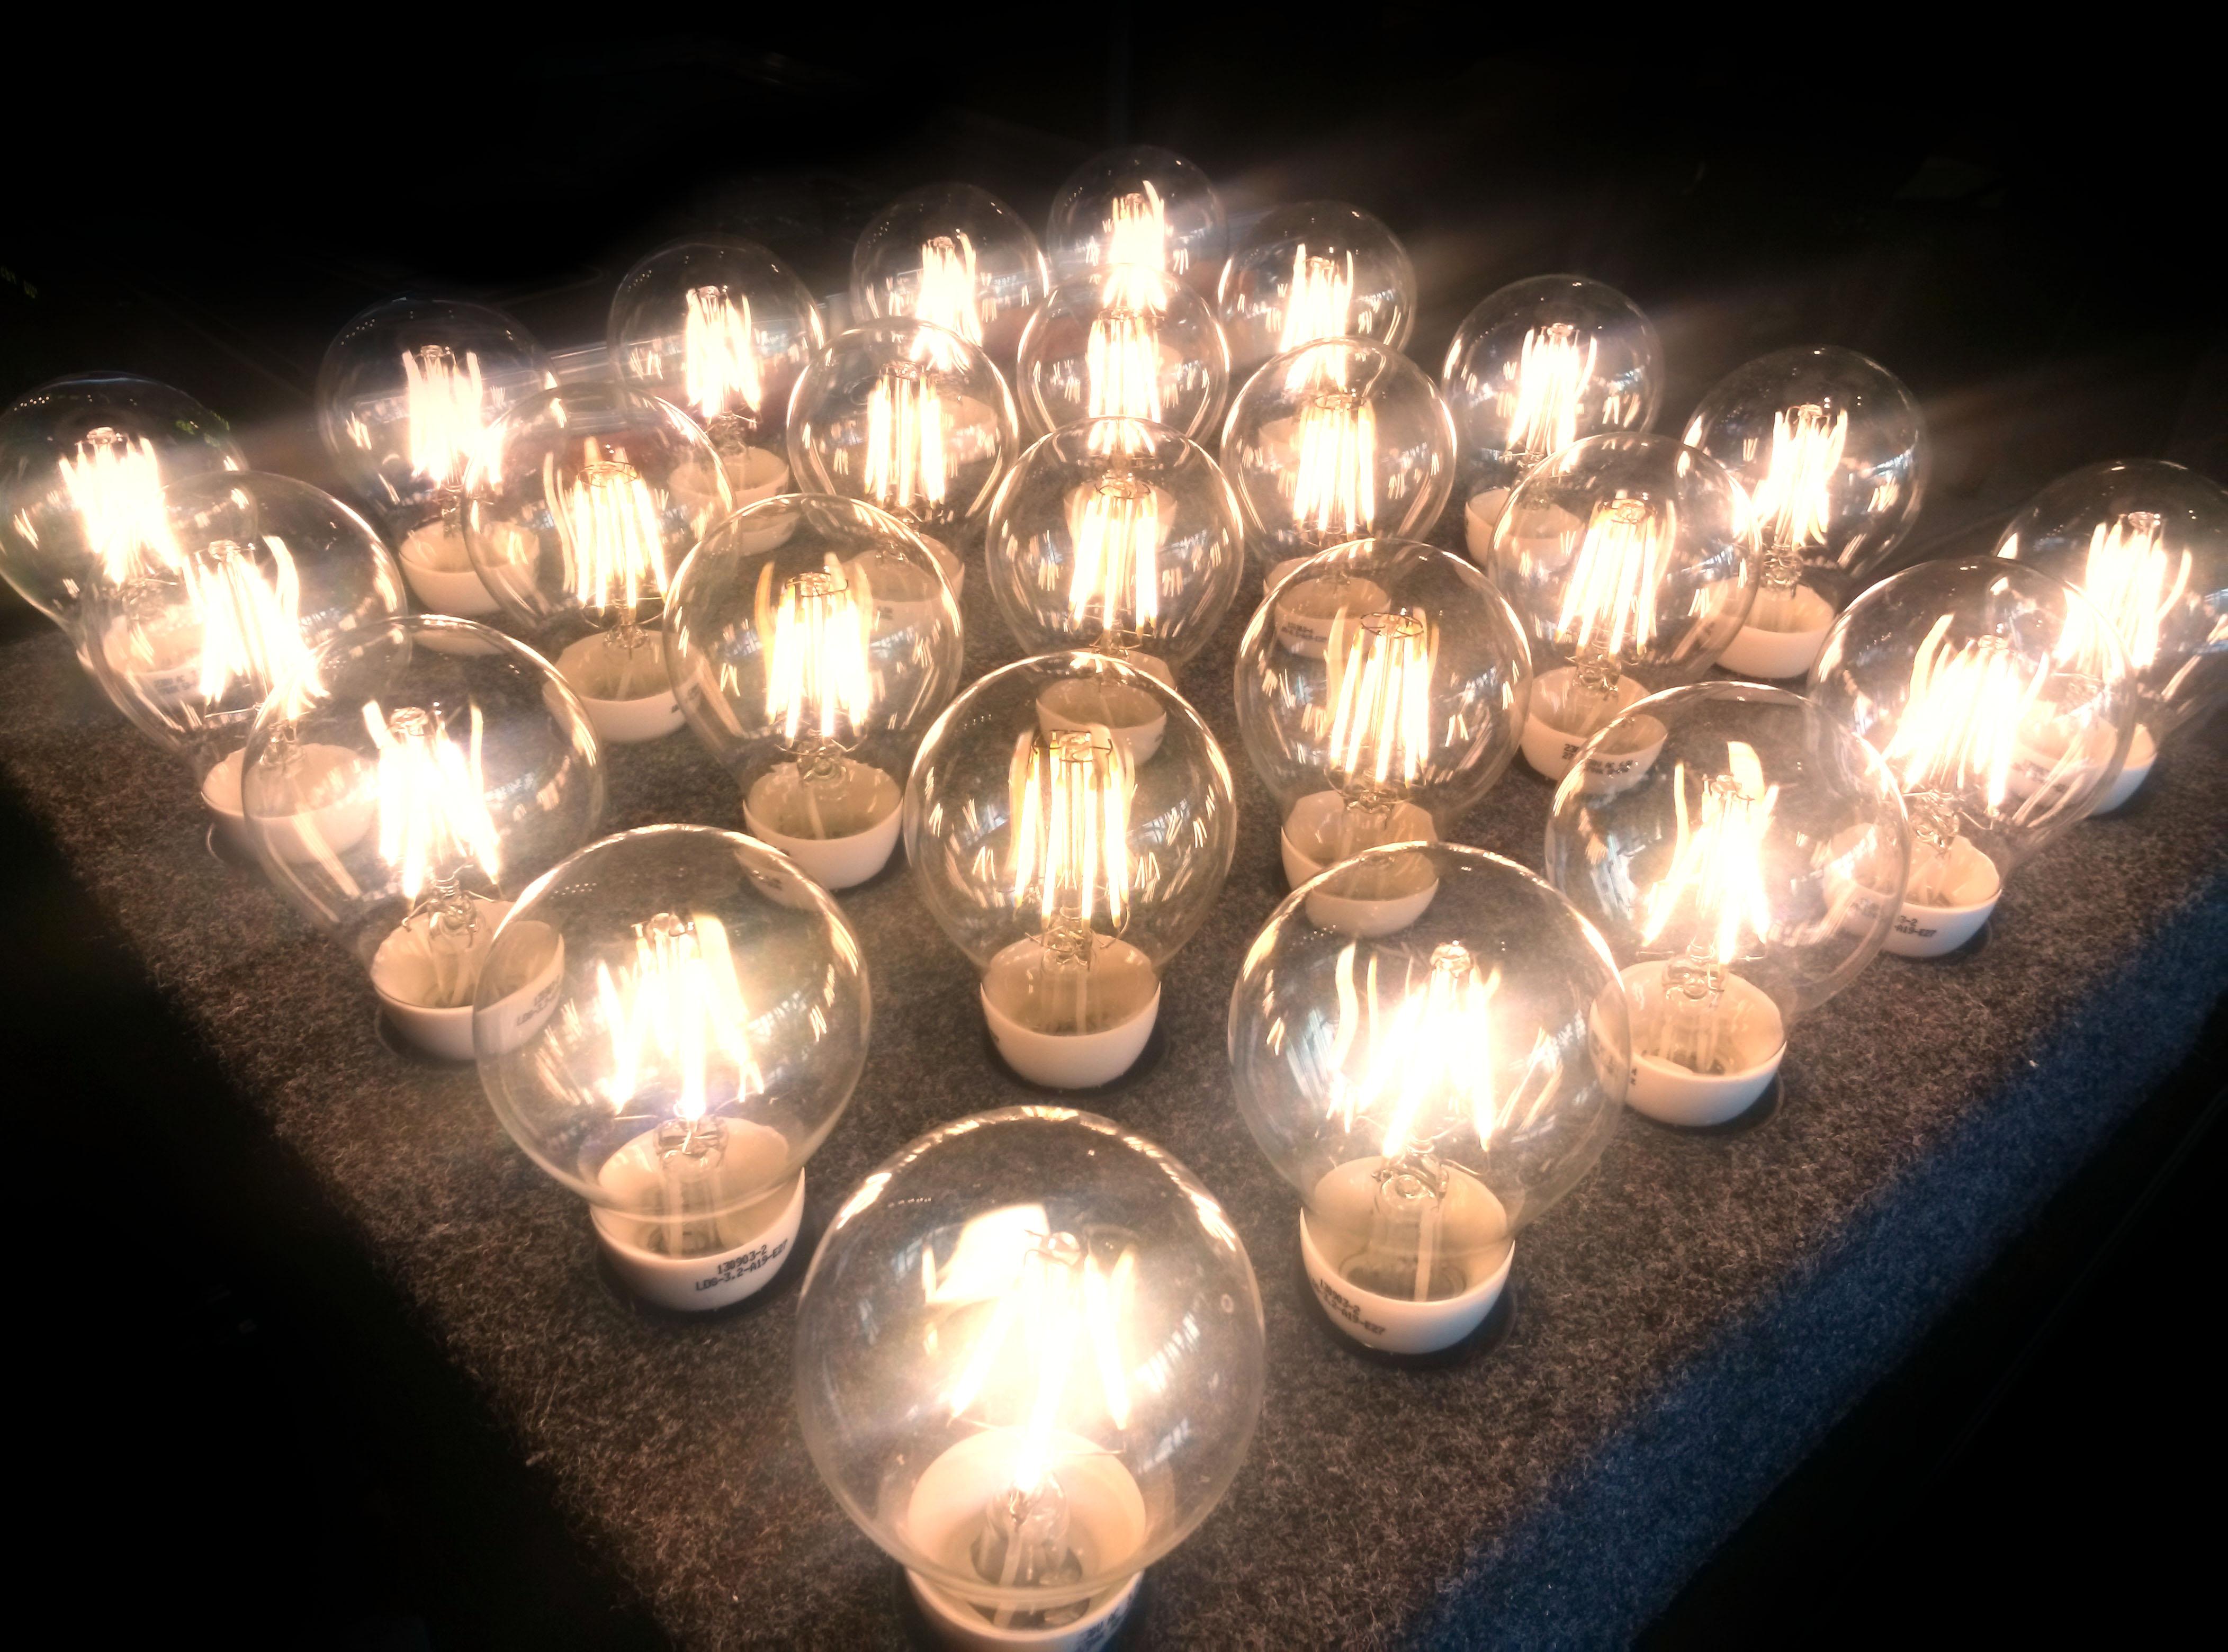 Kronleuchter Mit Kerzen Und Glühbirnen ~ Details zu windstoß windstoßkerze kerze kerzenlampe glühlampe